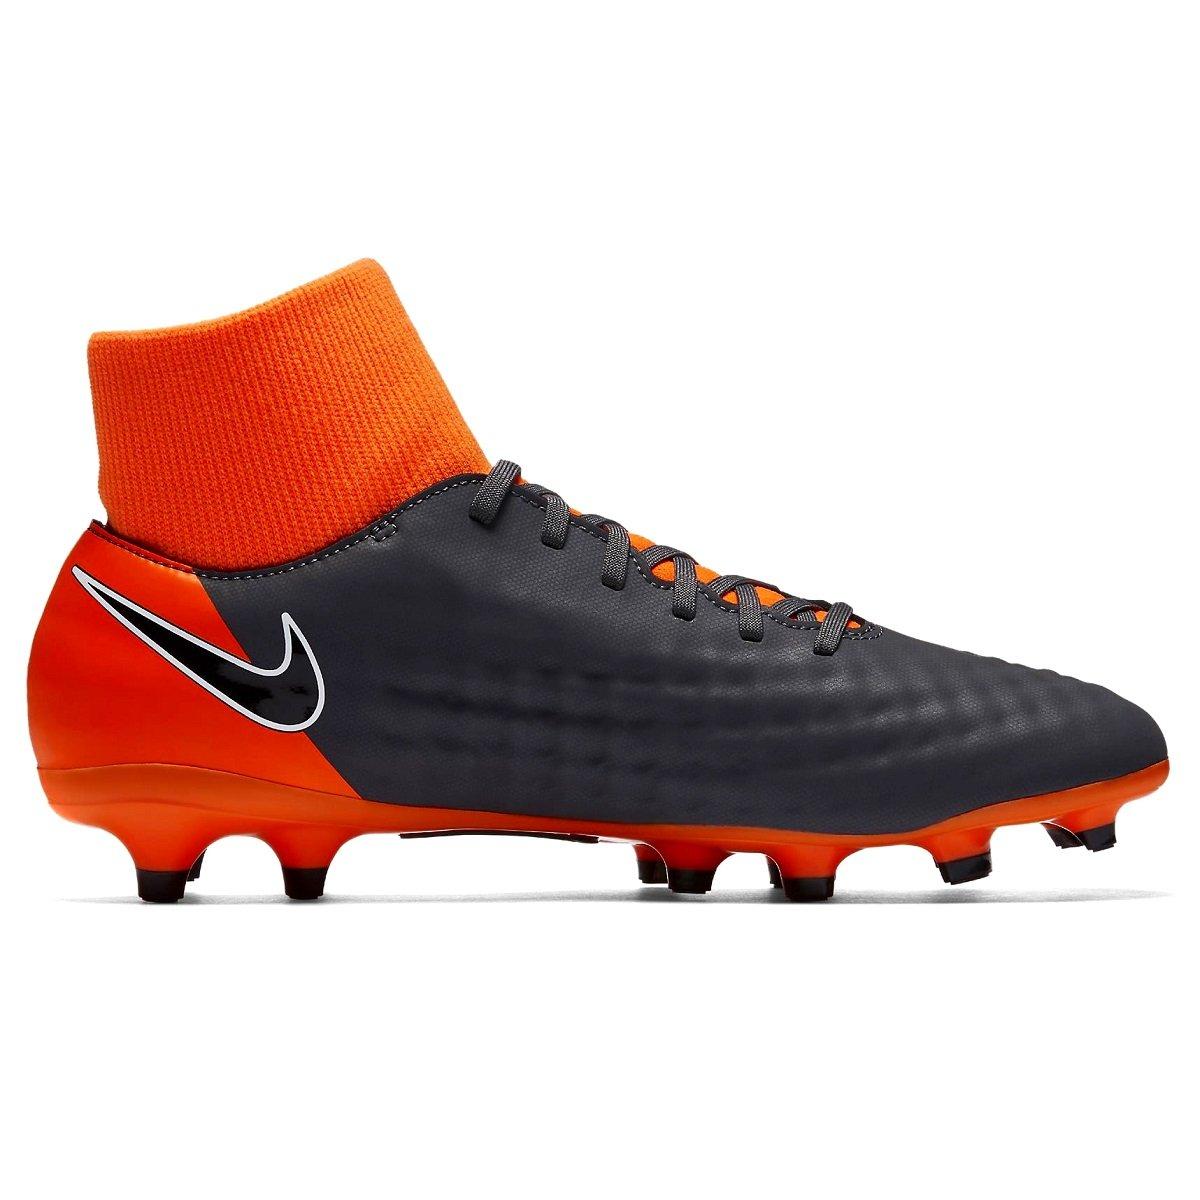 Chuteira Nike Magista Obra II Academy DF FG AH7303-080 Cinza Laranja ff70dddccc079